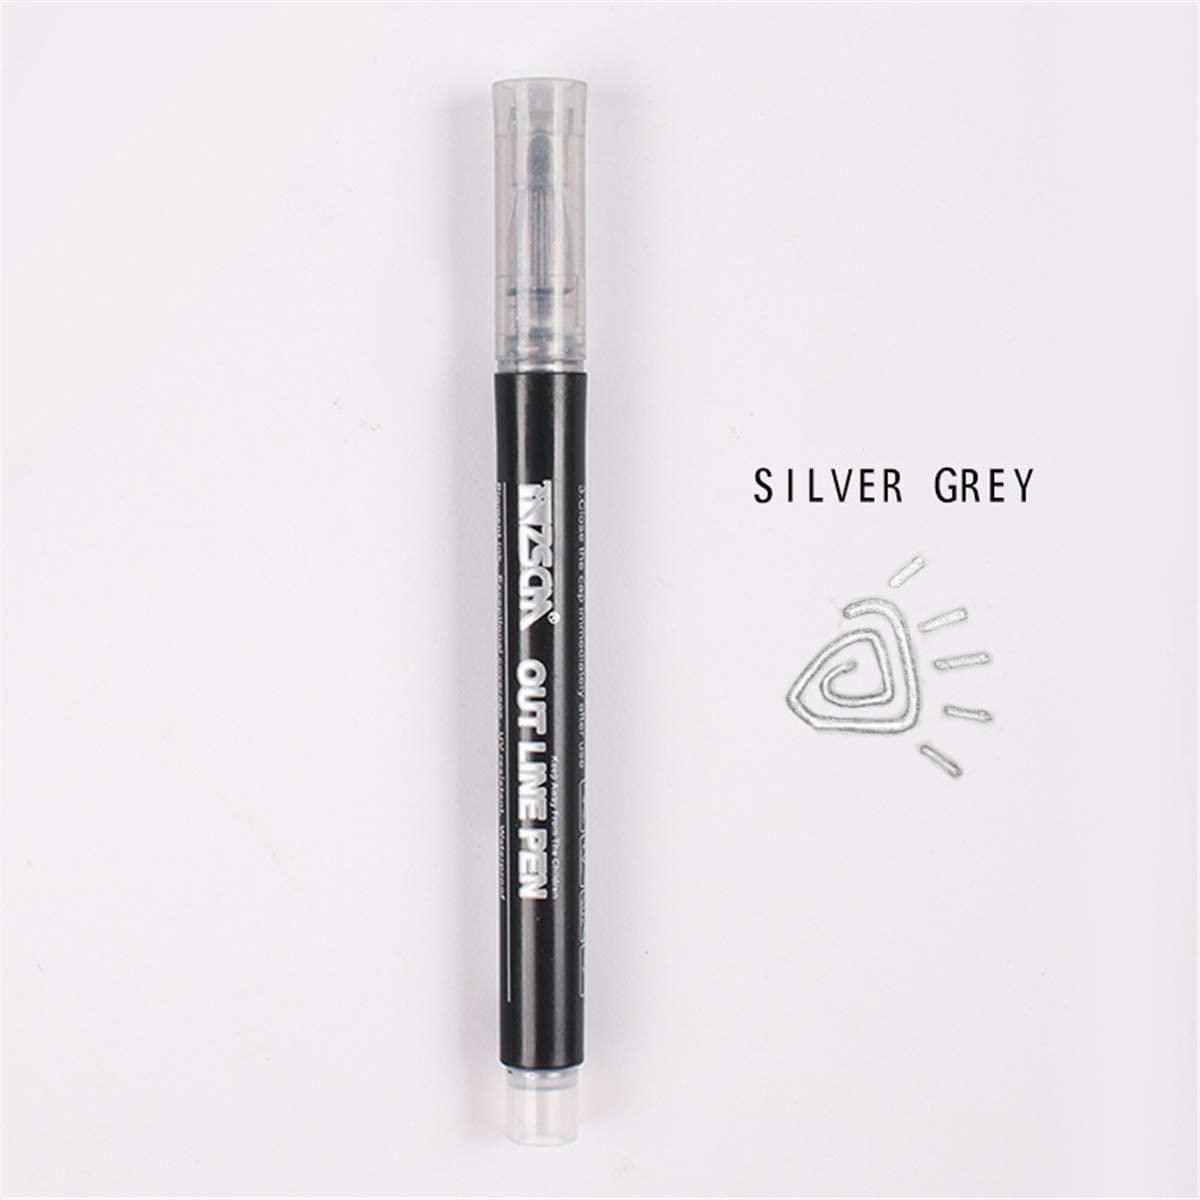 minansostey Double Lines Art Markers Pen Out Line Pen Scrapbooking Pens Fine Liner Marker Fineliner Calligraphy Lettering Pen Color